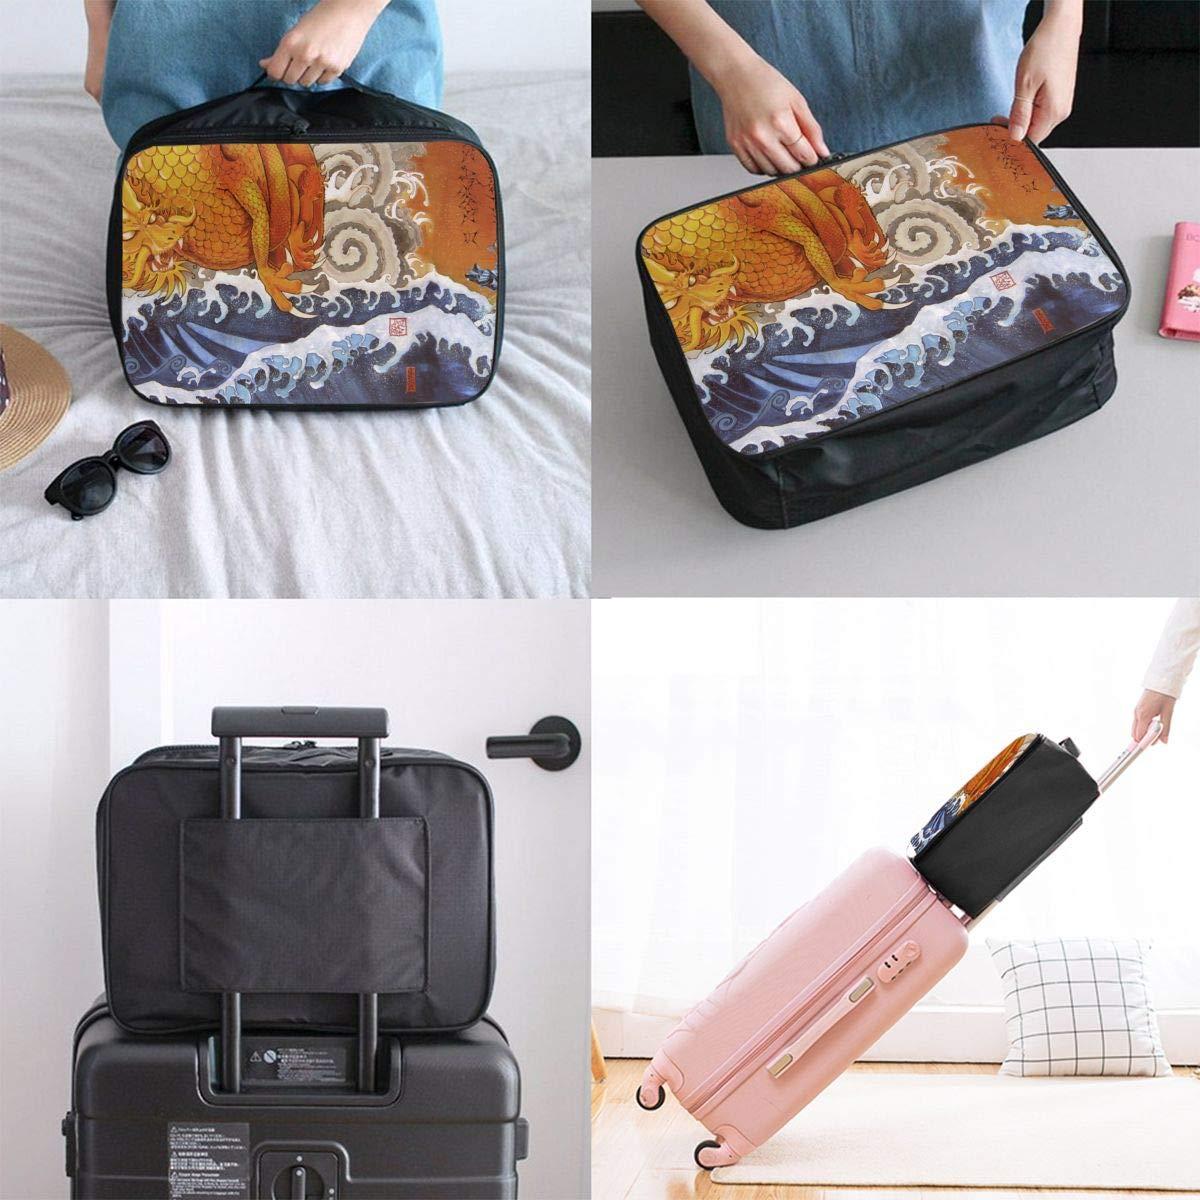 ADGAI Japanese Mountain Sea Gold Dragon Canvas Travel Weekender Bag,Fashion Custom Lightweight Large Capacity Portable Luggage Bag,Suitcase Trolley Bag